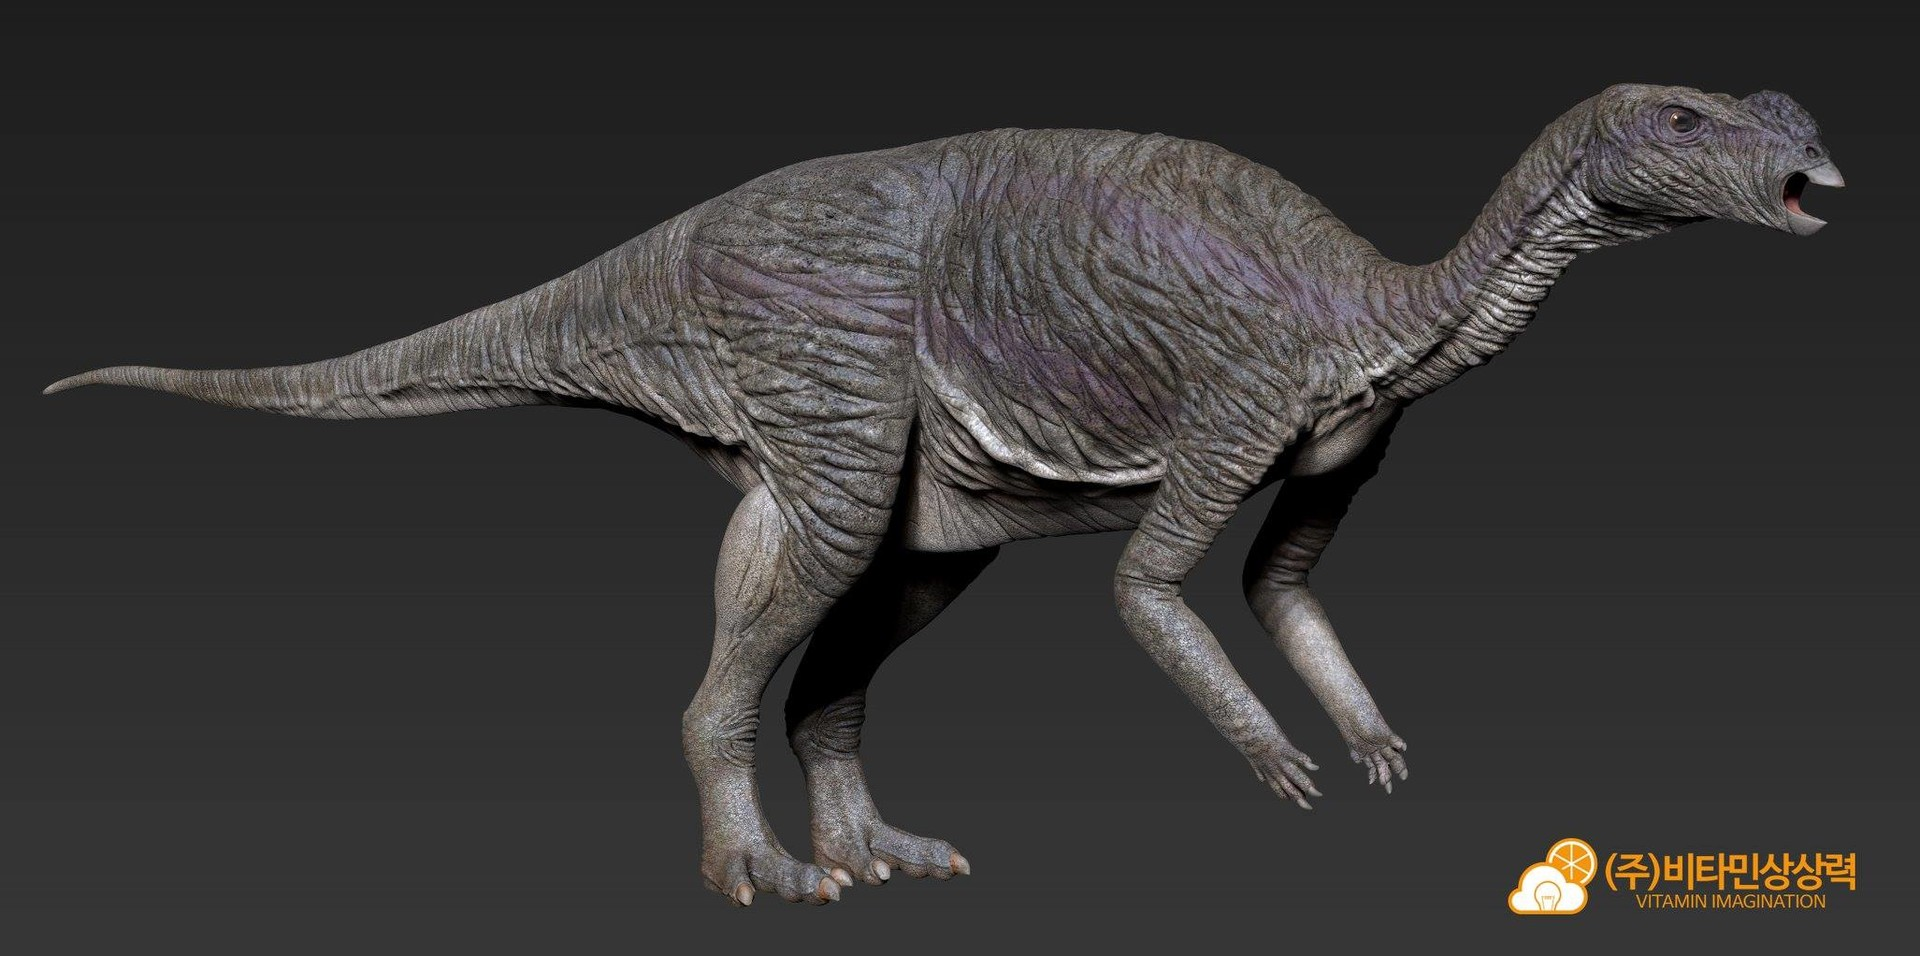 Jin kyeom kim muttaburrasaurus